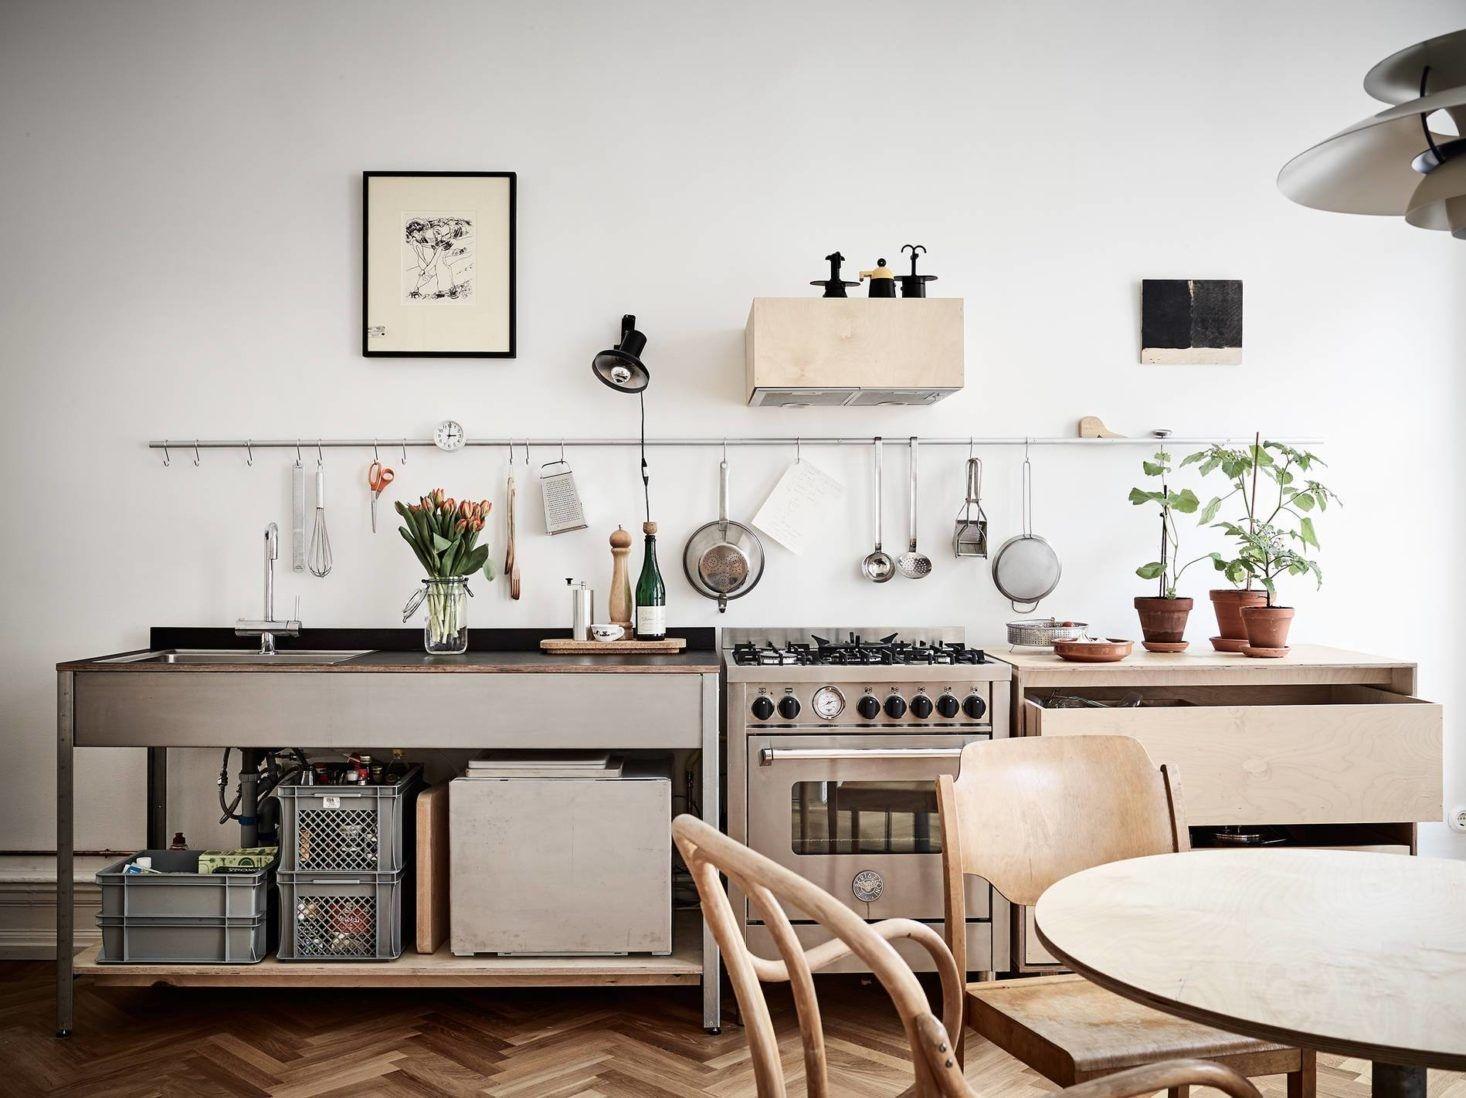 ide kreatif tempat pisau dapur minimalis